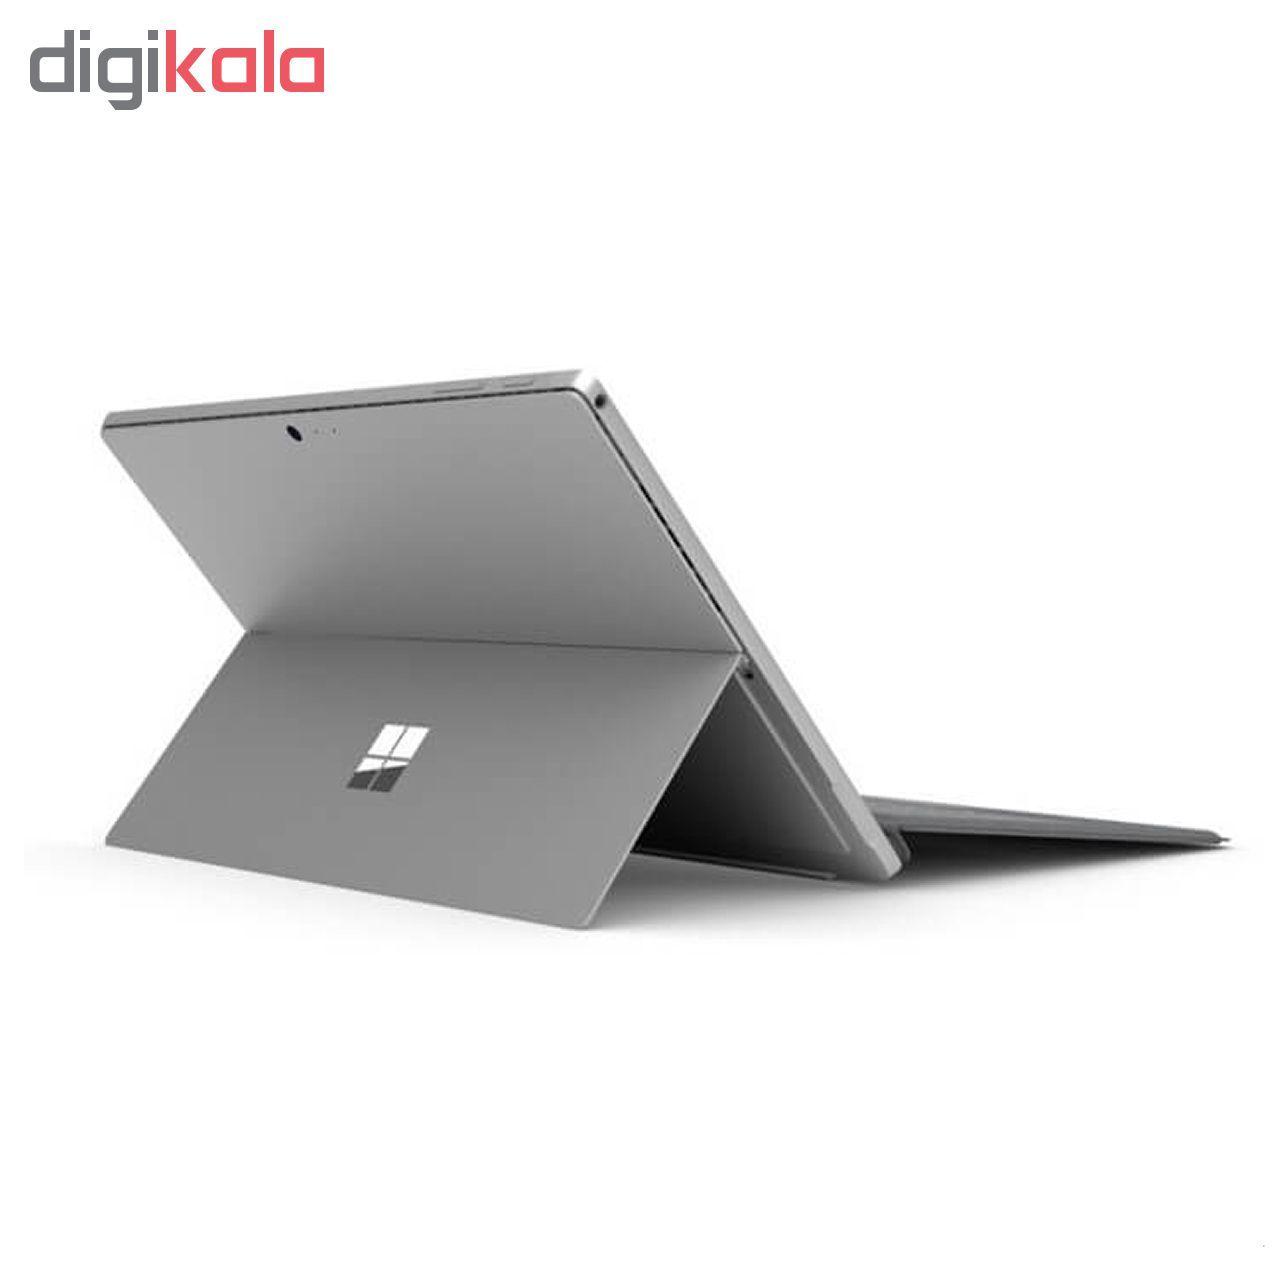 تبلت مایکروسافت مدل Surface Pro 6 - H به همراه کیبورد Signature و قلم main 1 1